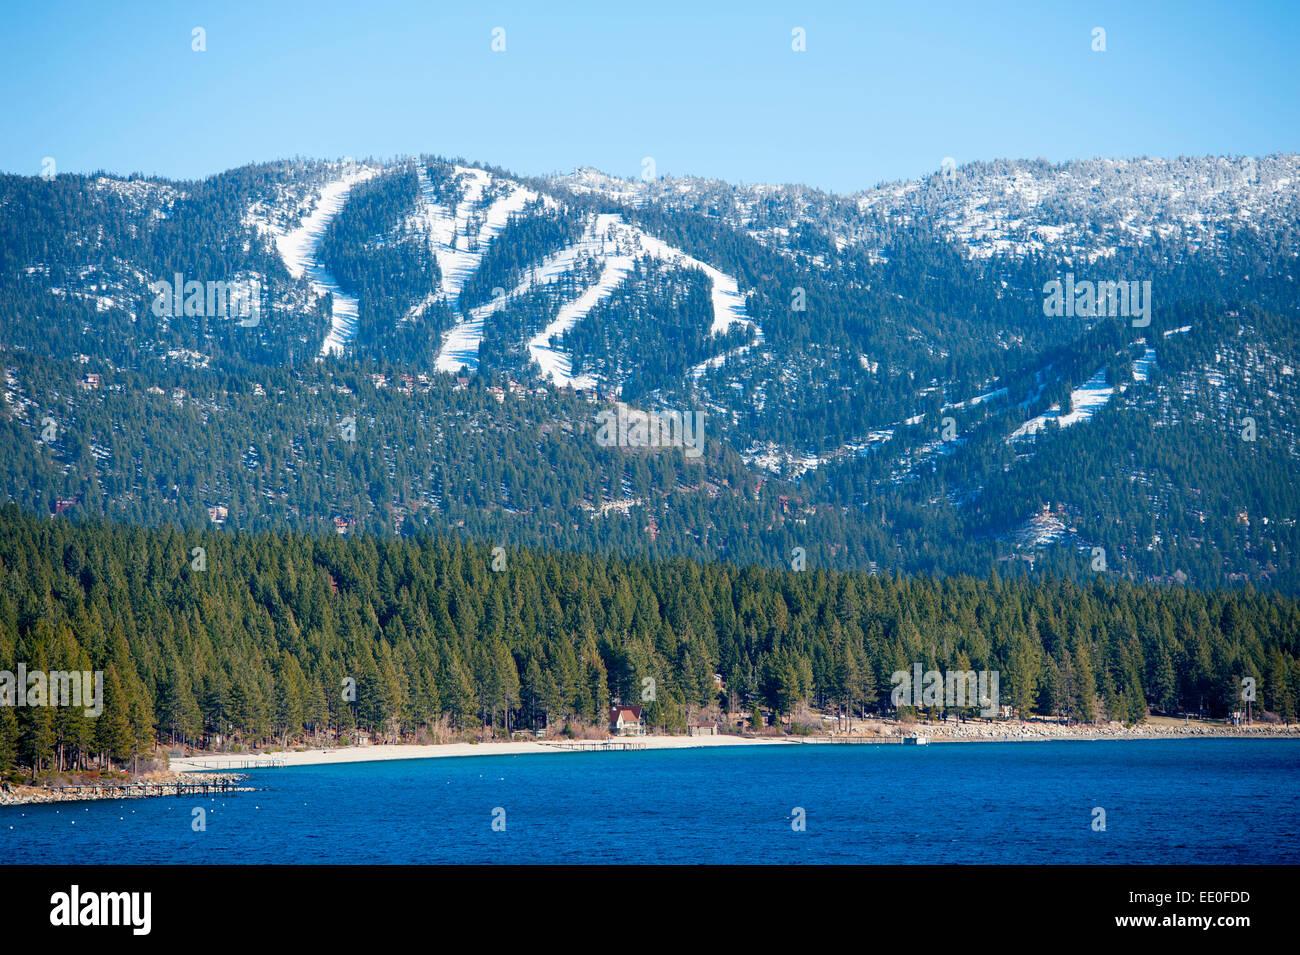 usa-nevada-nv-lake-tahoe-winter-view-of-incline-village-and-the-diamond-EE0FDD.jpg